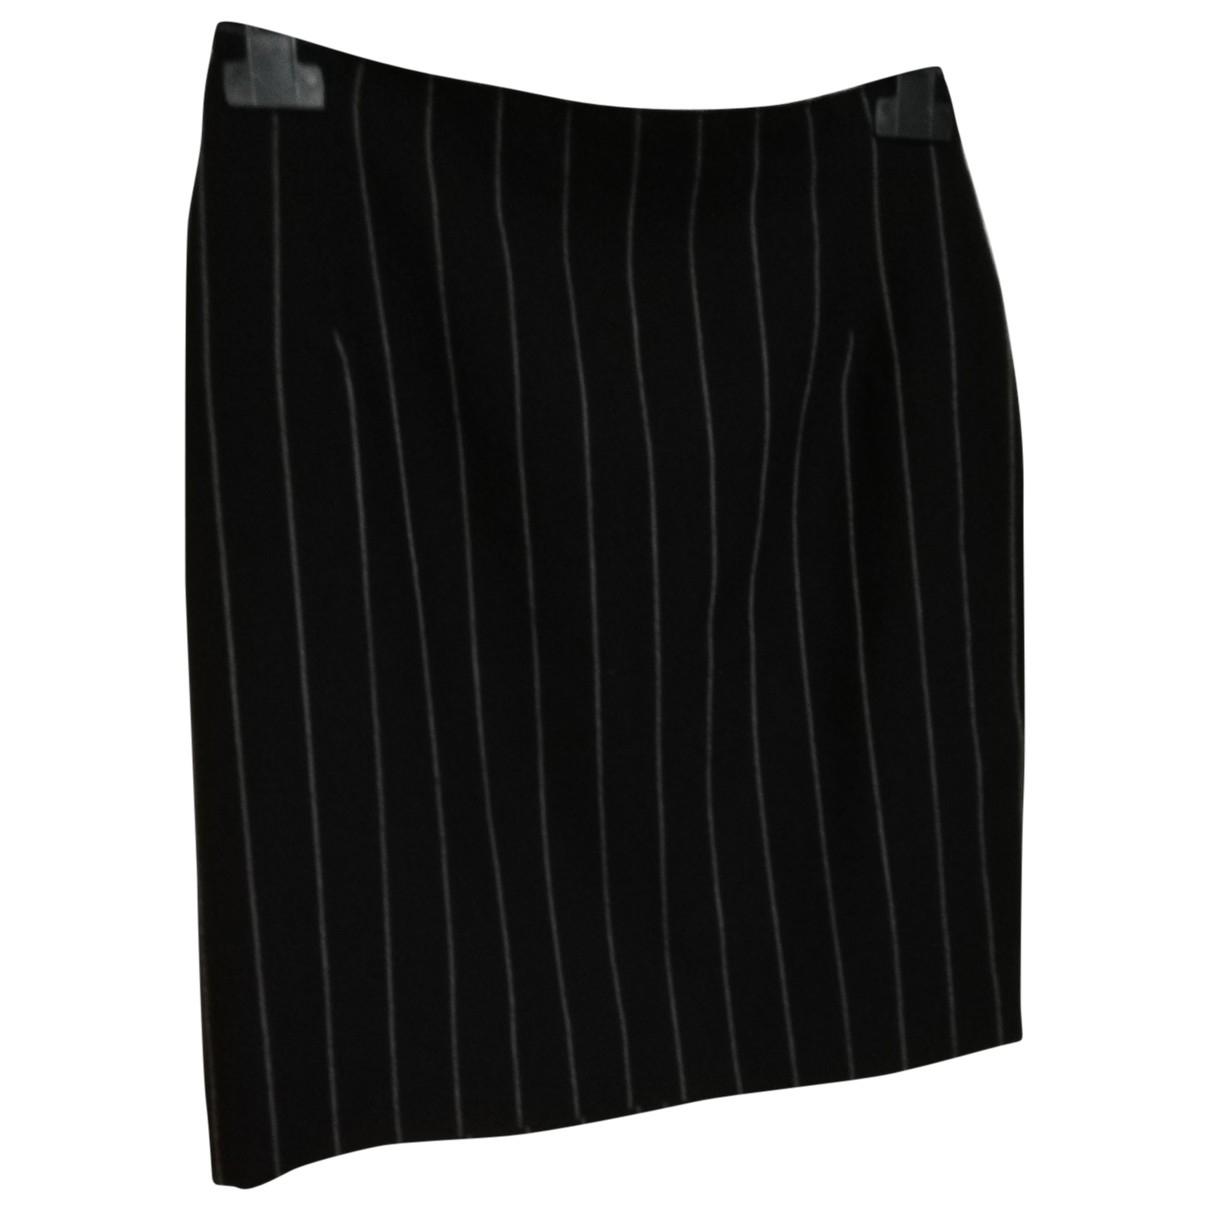 Krizia \N Anthracite Wool skirt for Women 44 IT